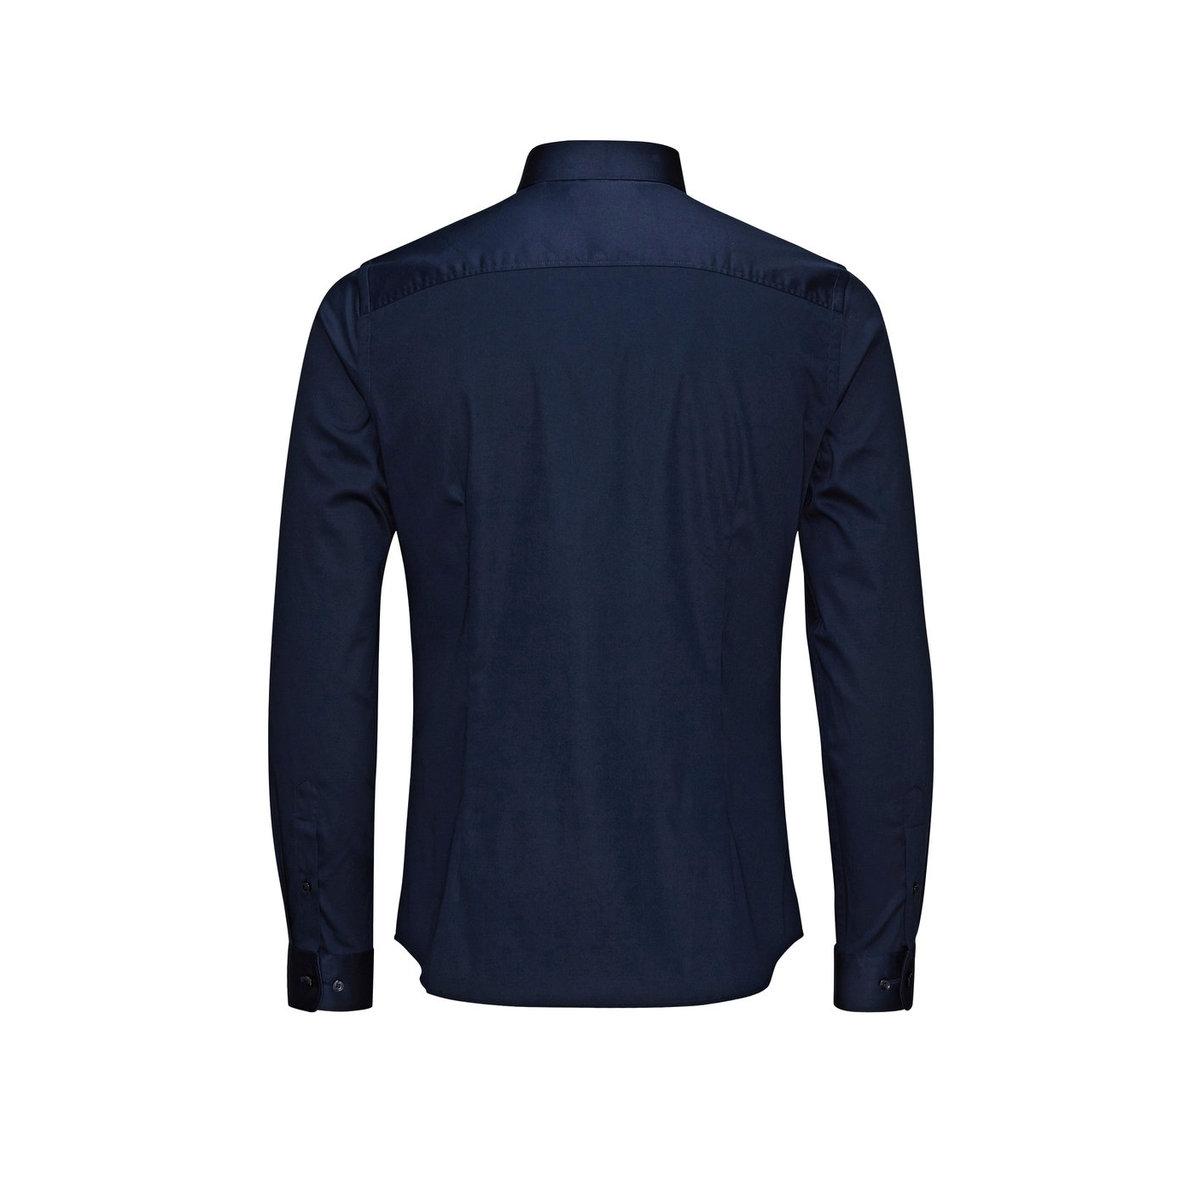 jjprparma shirt l/s noos 12097662 jack & jones overhemd navy blazer